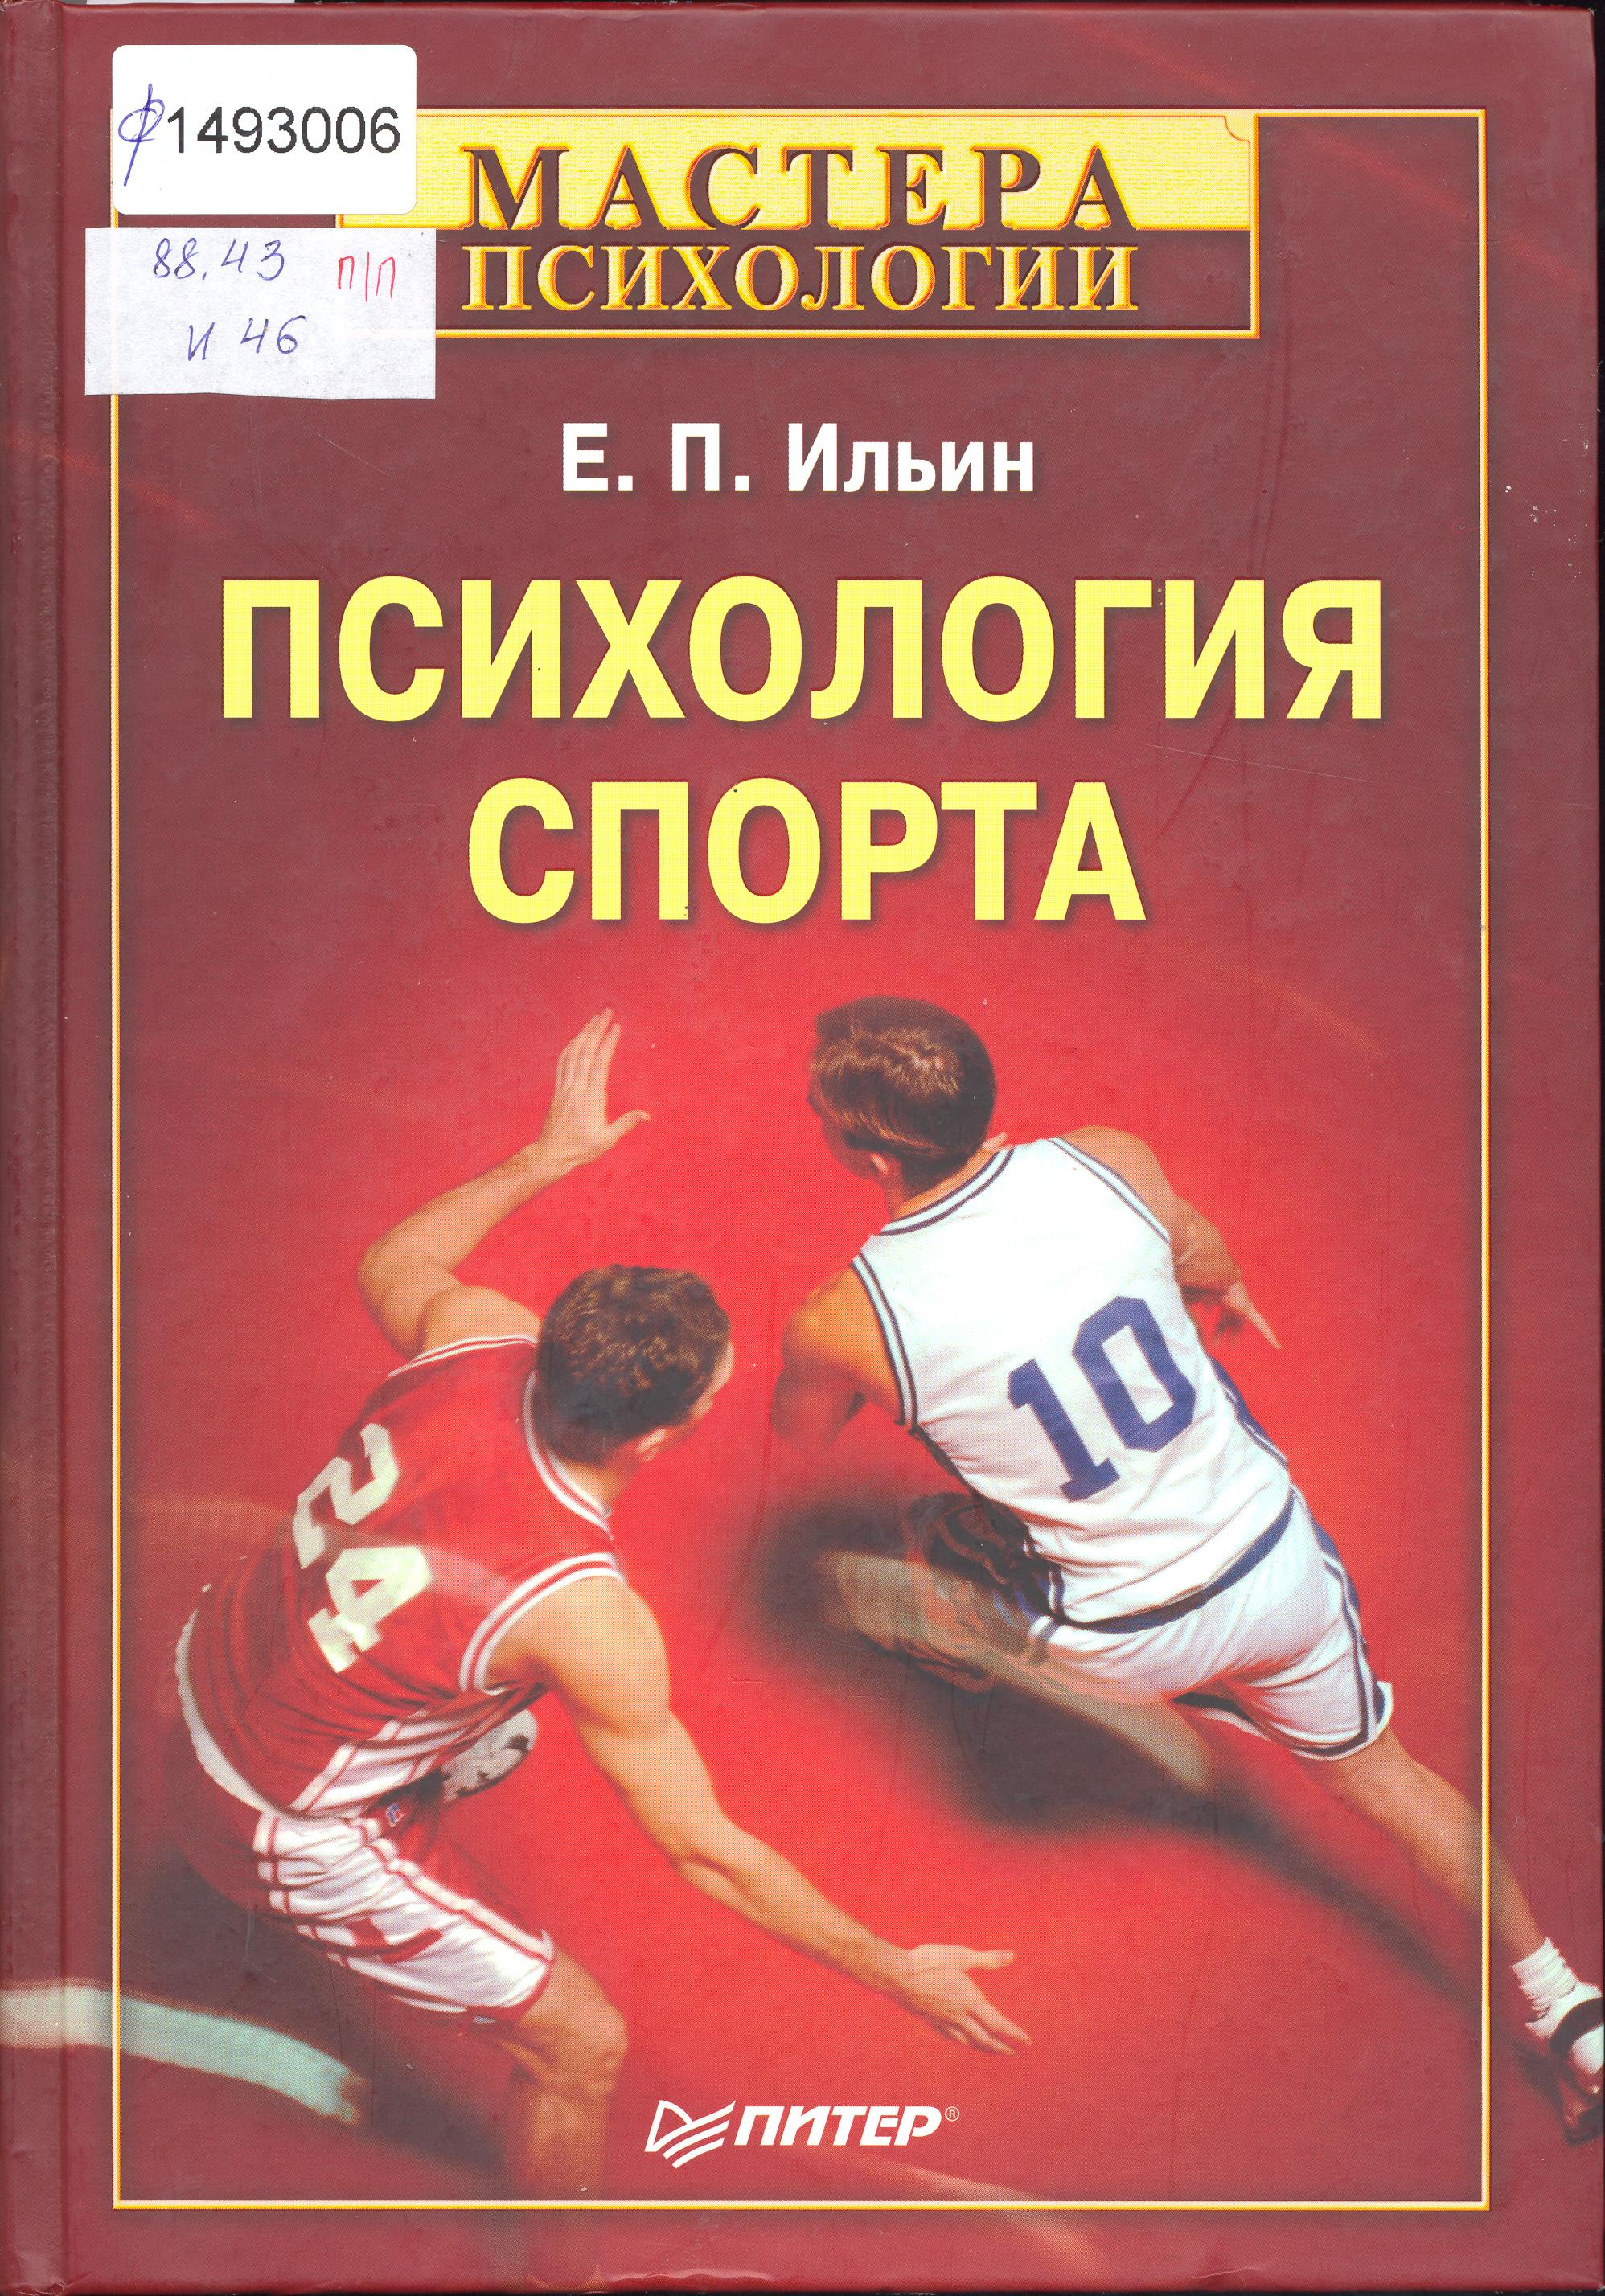 Книги про спортсменов